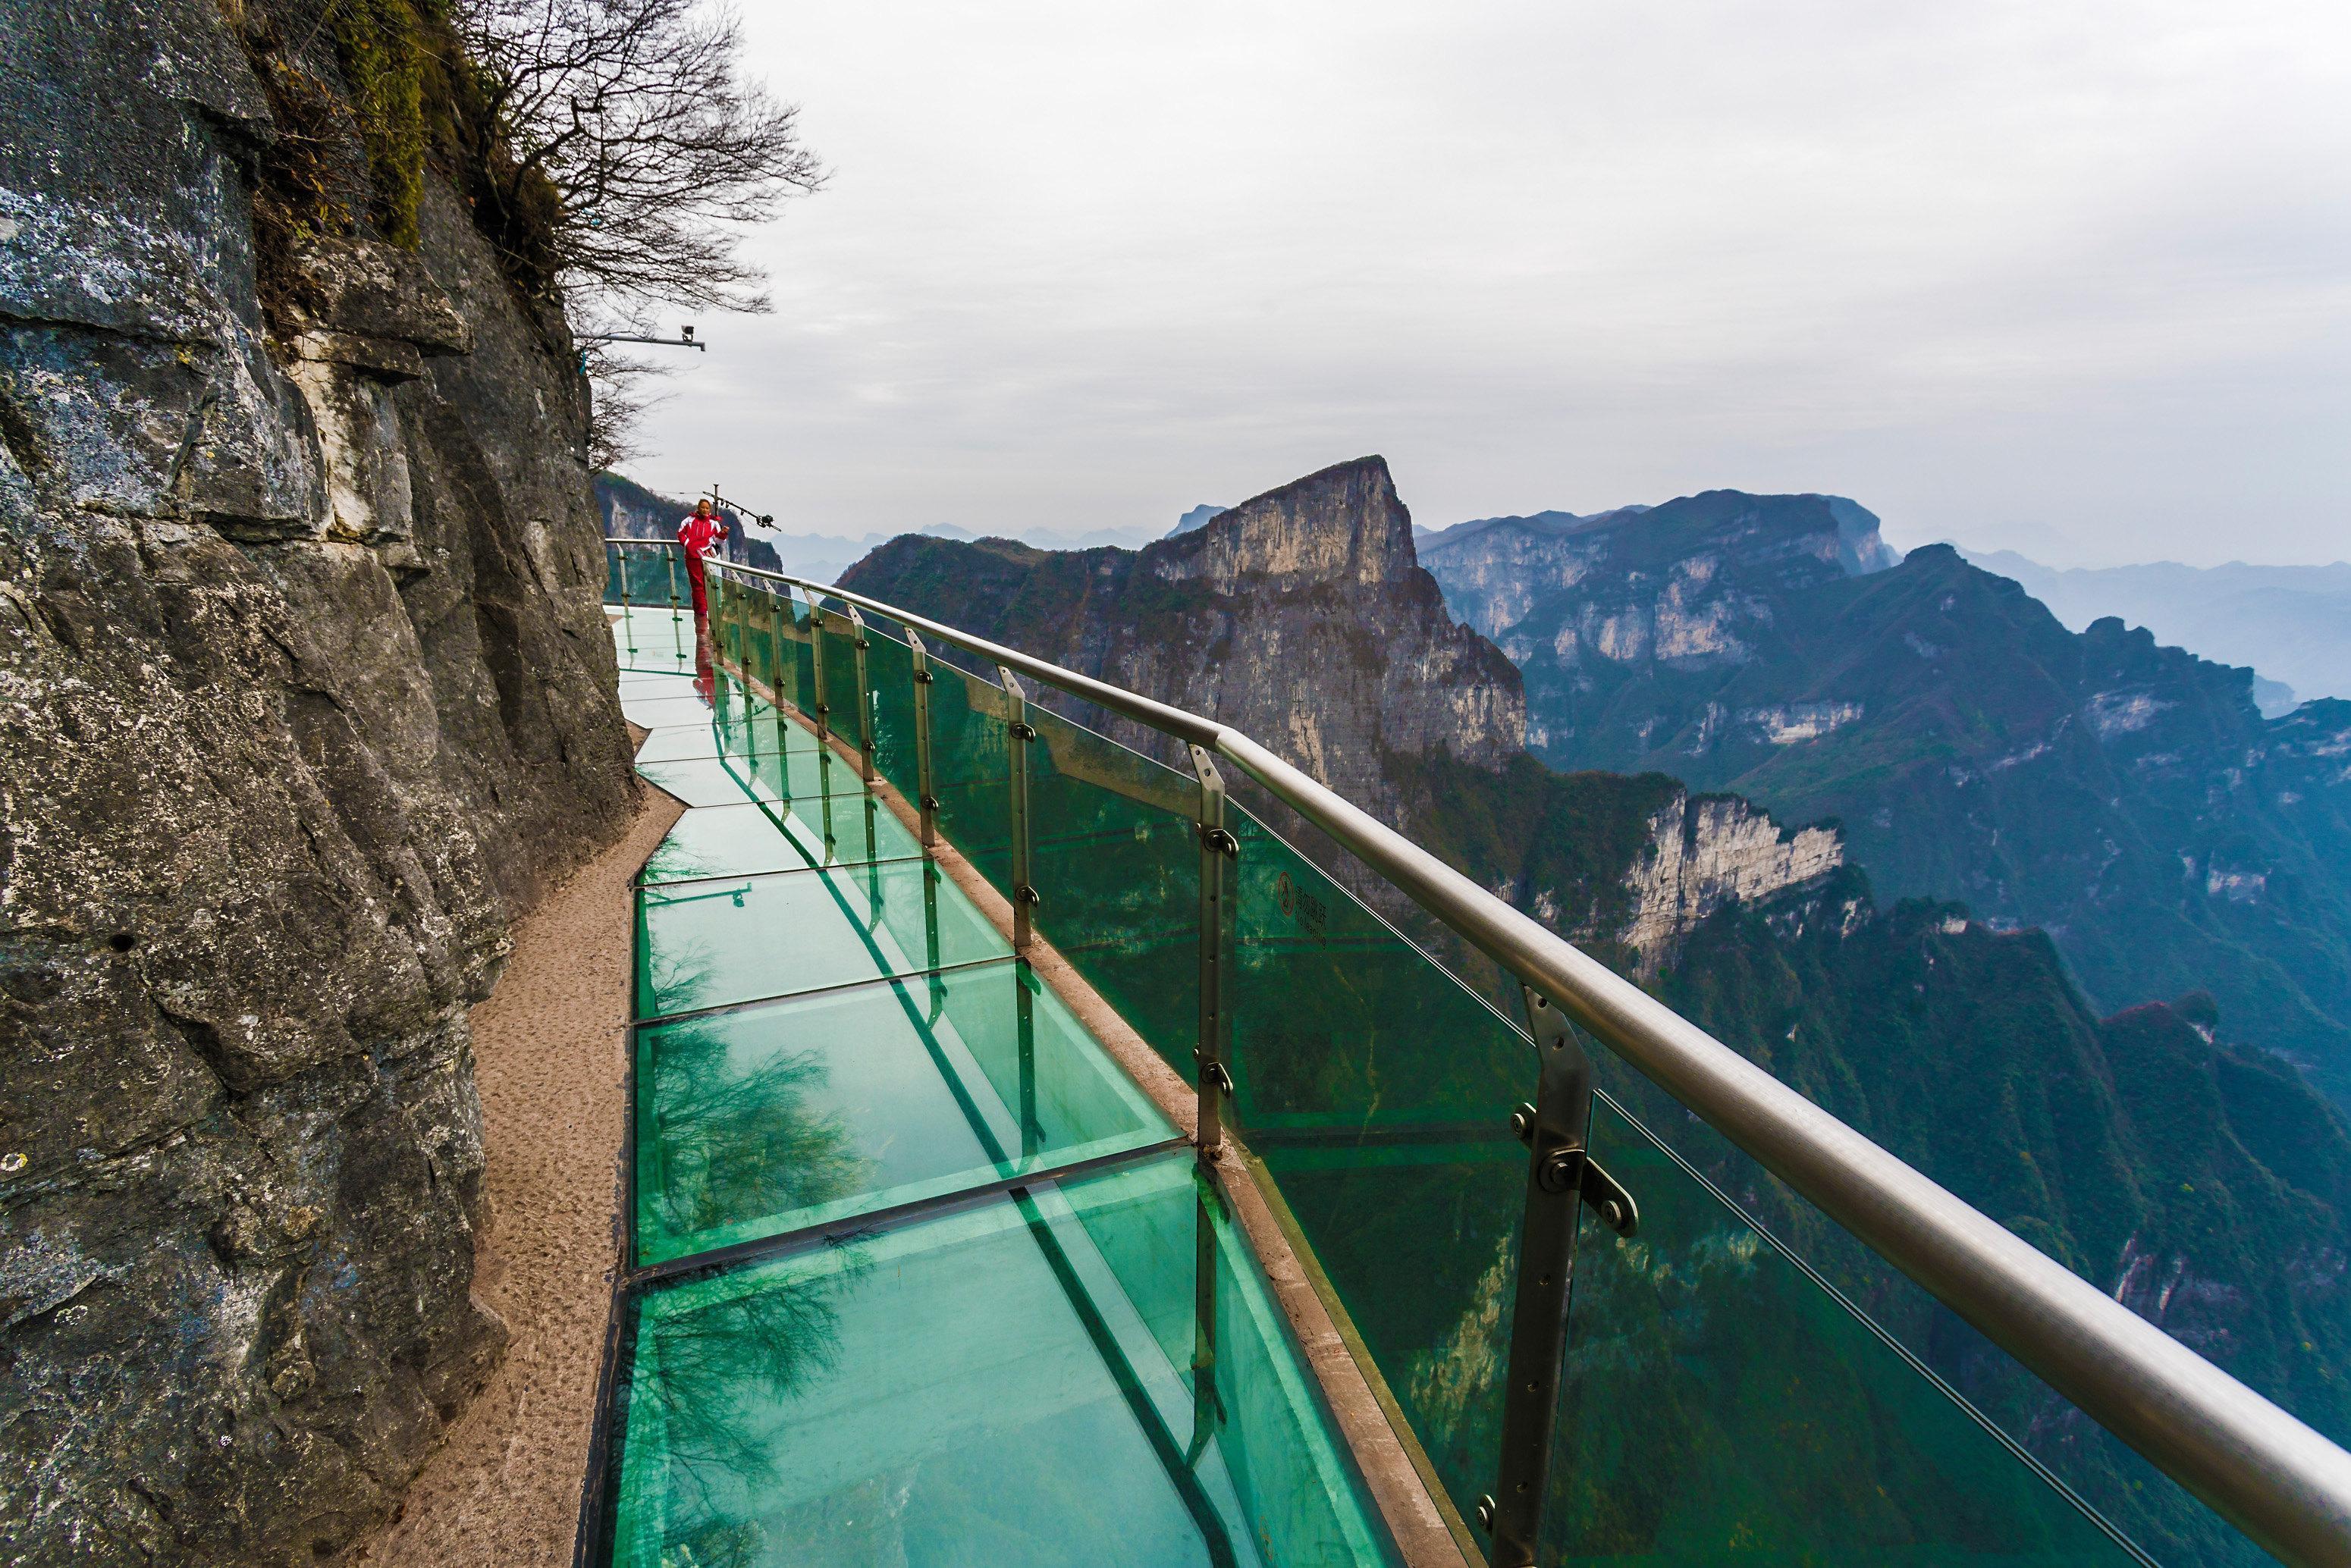 One-Day Tour in Tianmen Mountain and Glass Bridge